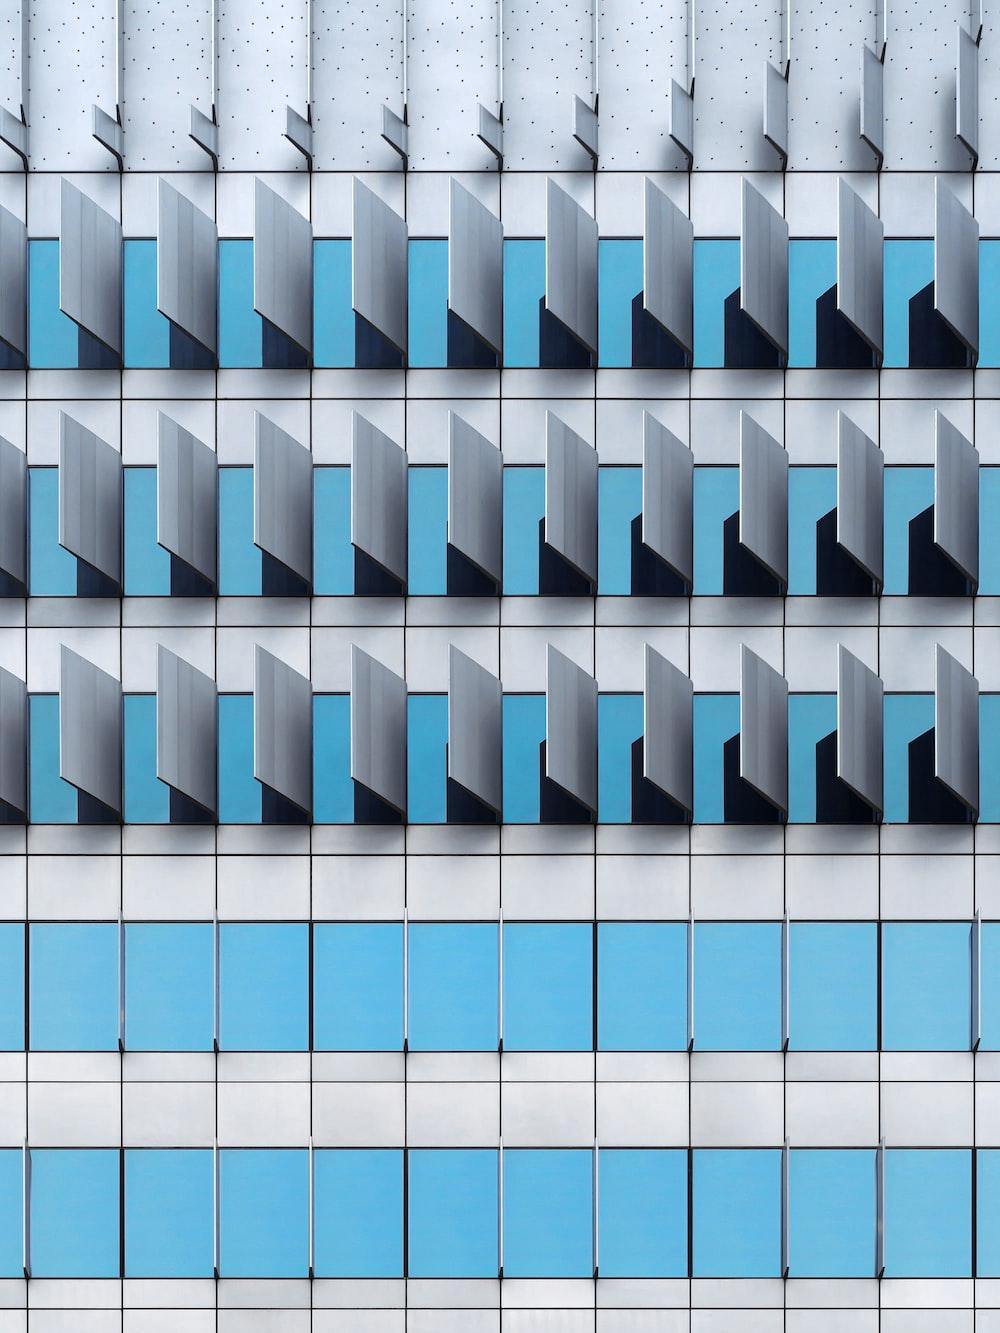 blue and white checkered illustration